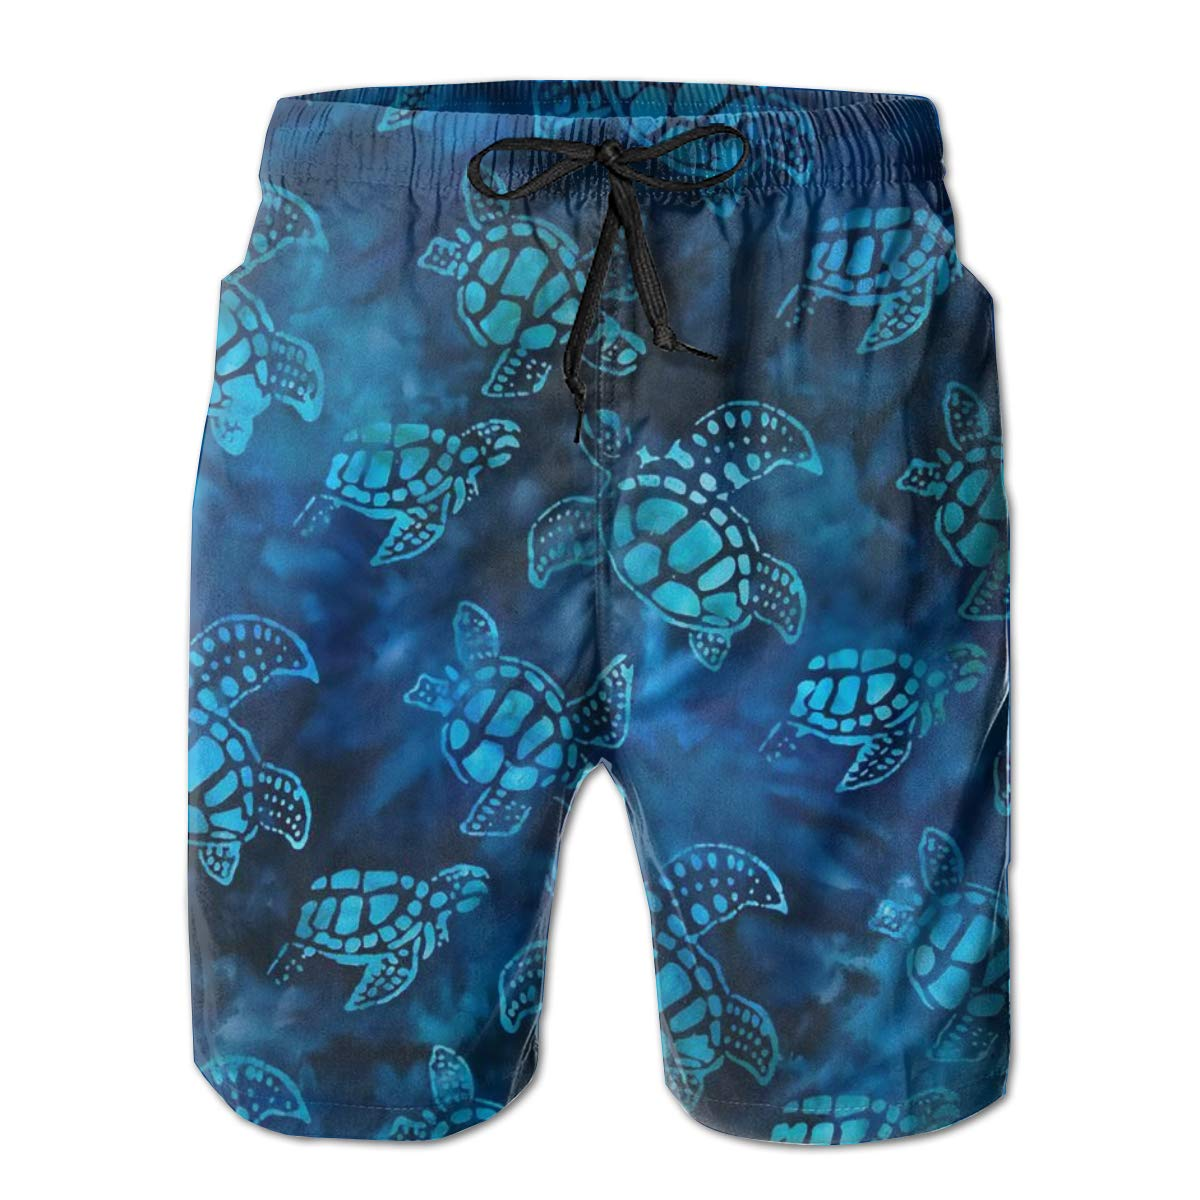 3D Printed Swimsuit with Pockets Mens 100/% Polyester Dark Blue Green Robert Turtle Tie Dye Batik Beachwear